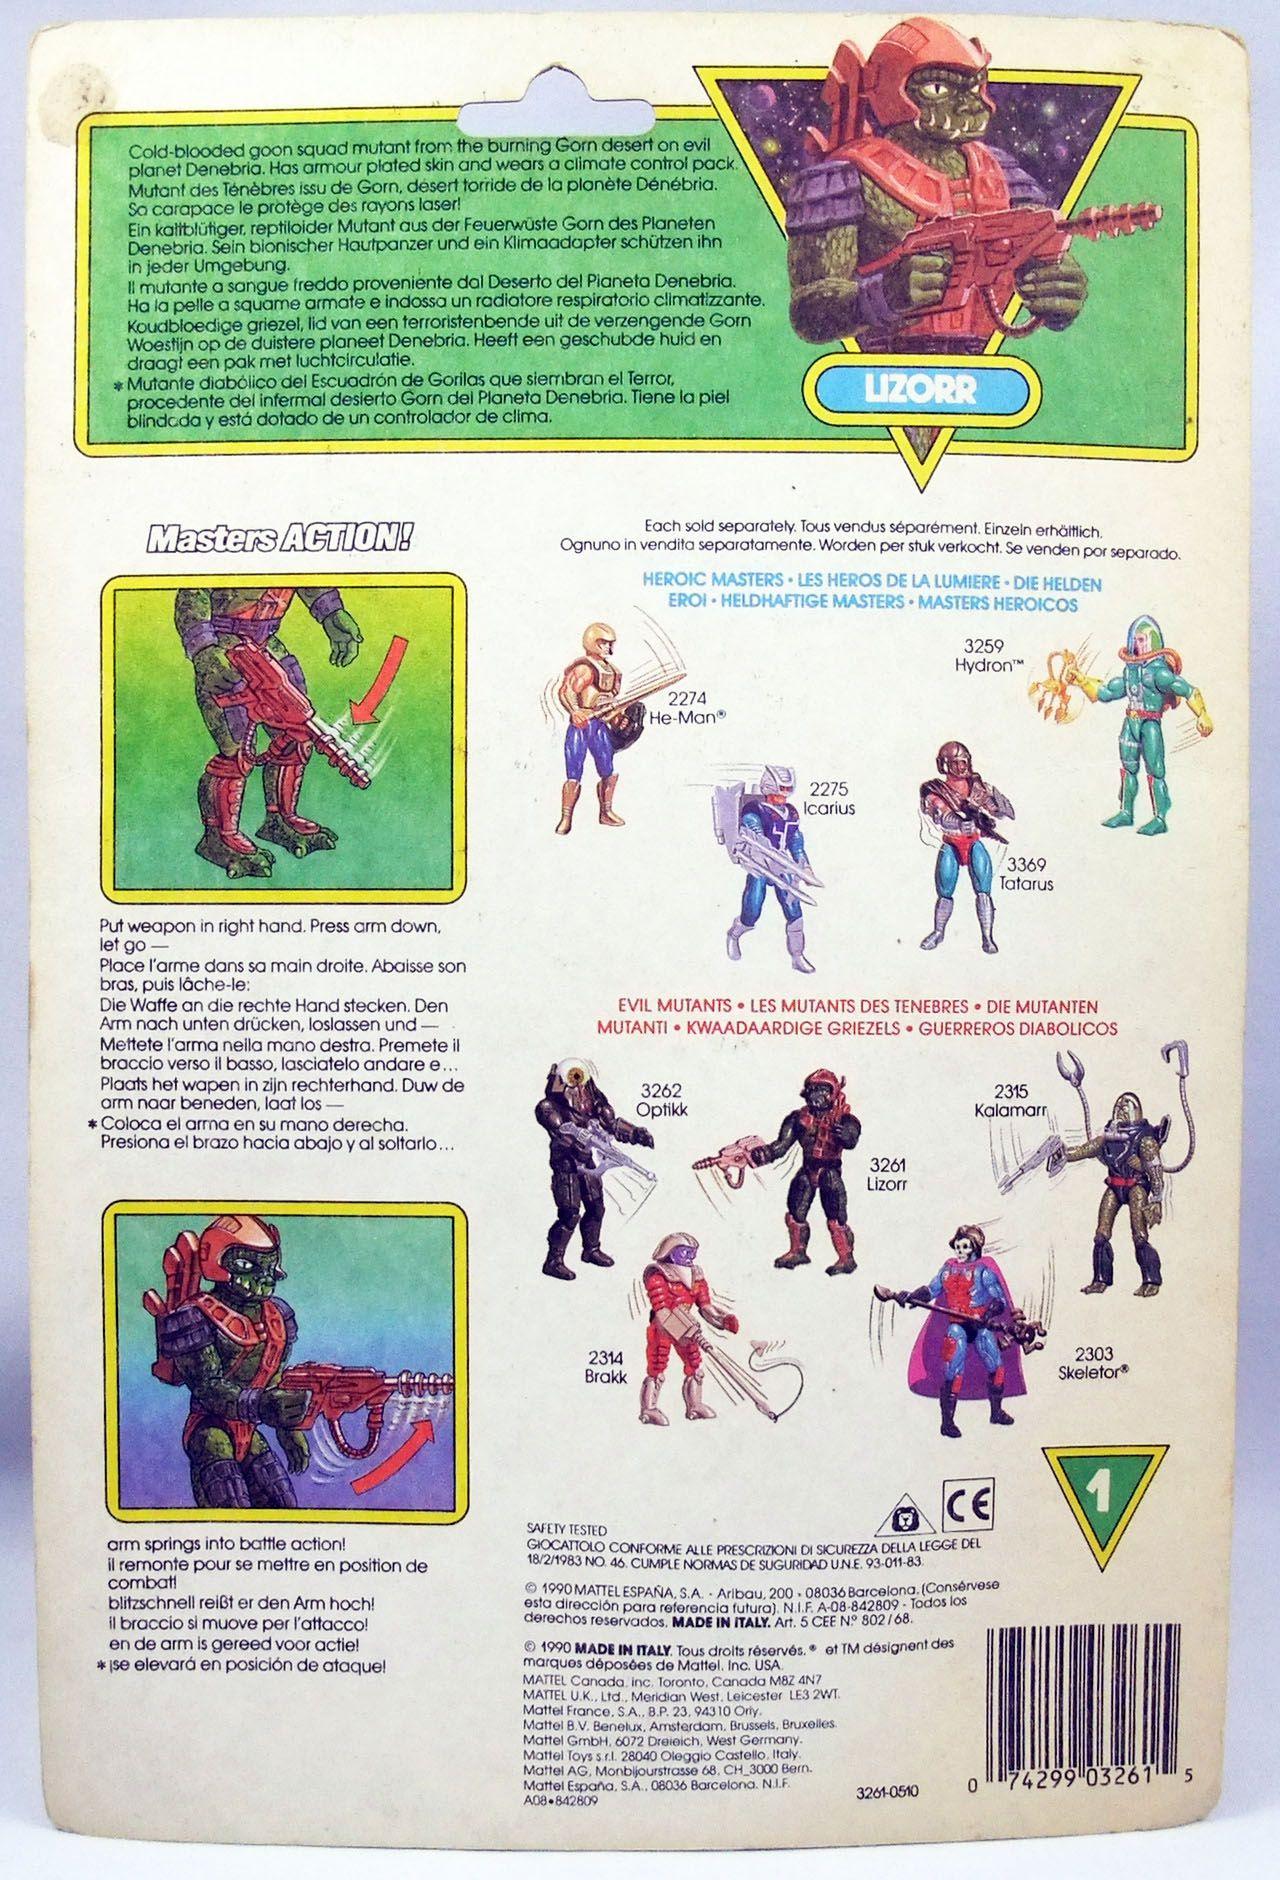 MOTU New Adventures of He-Man - Lizorr (Europe card)